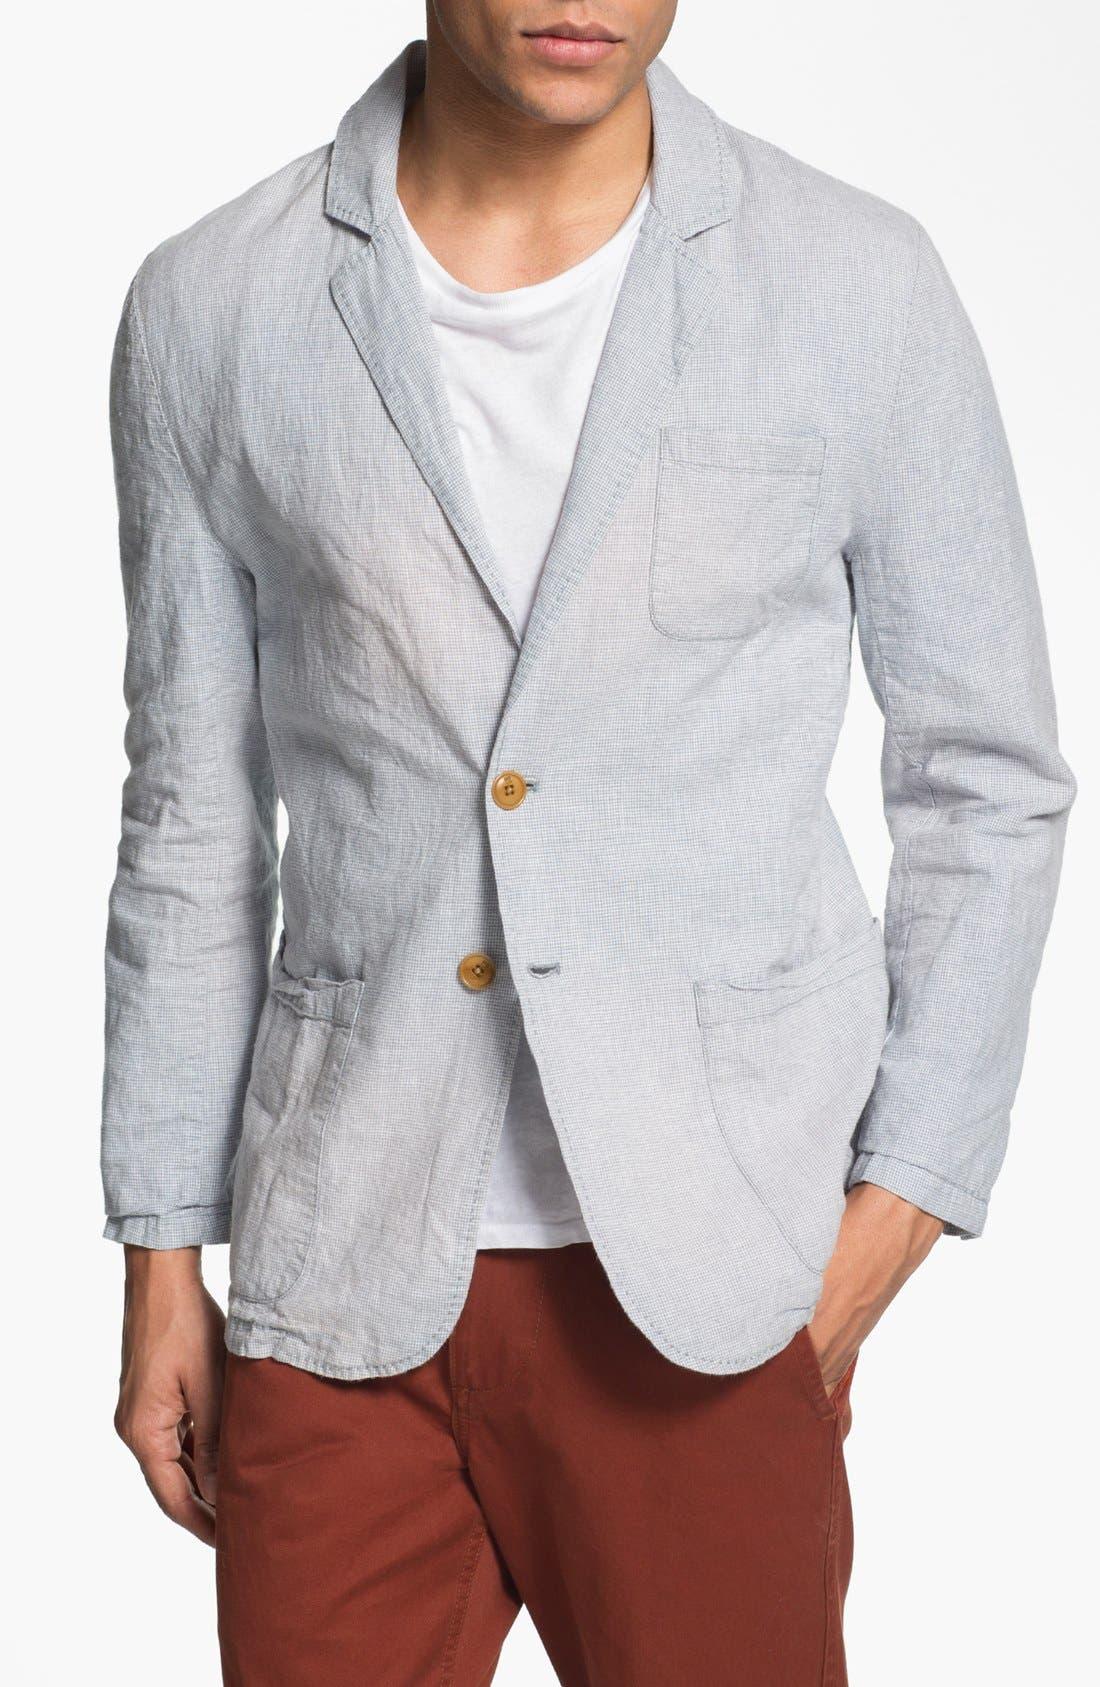 Alternate Image 1 Selected - Scotch & Soda Cotton & Linen Blazer